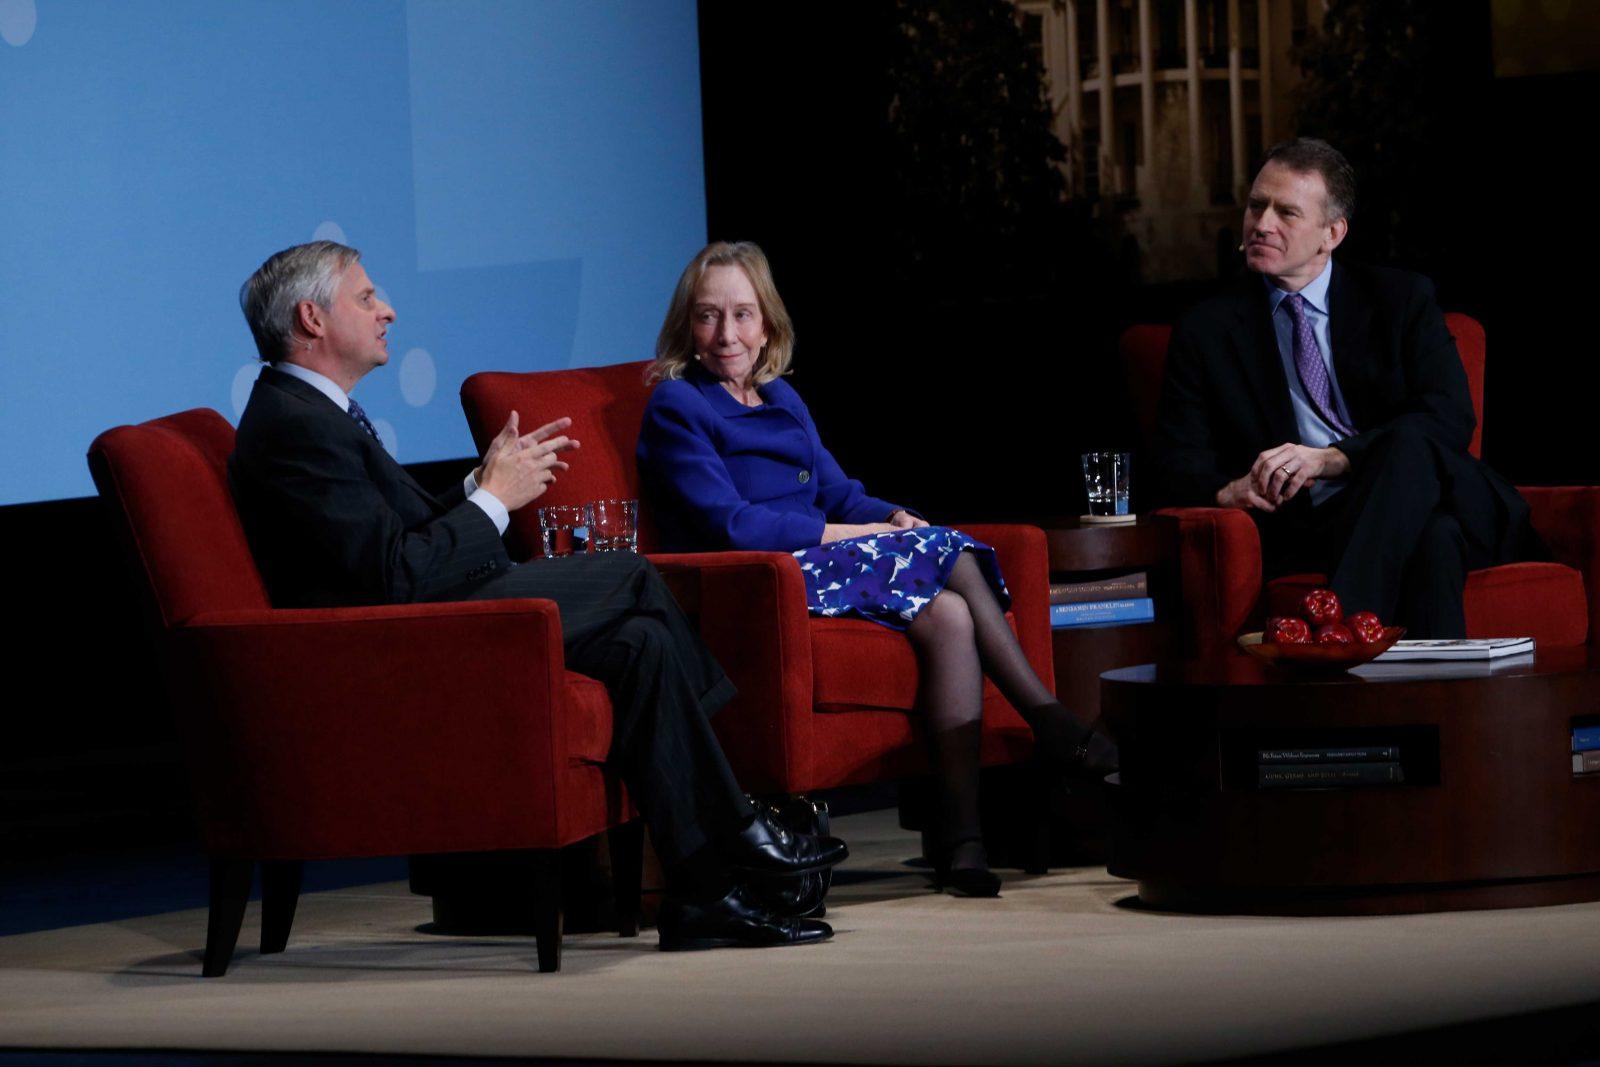 Jon Meacham & Doris Kearns Goodwin at The Richmond Forum